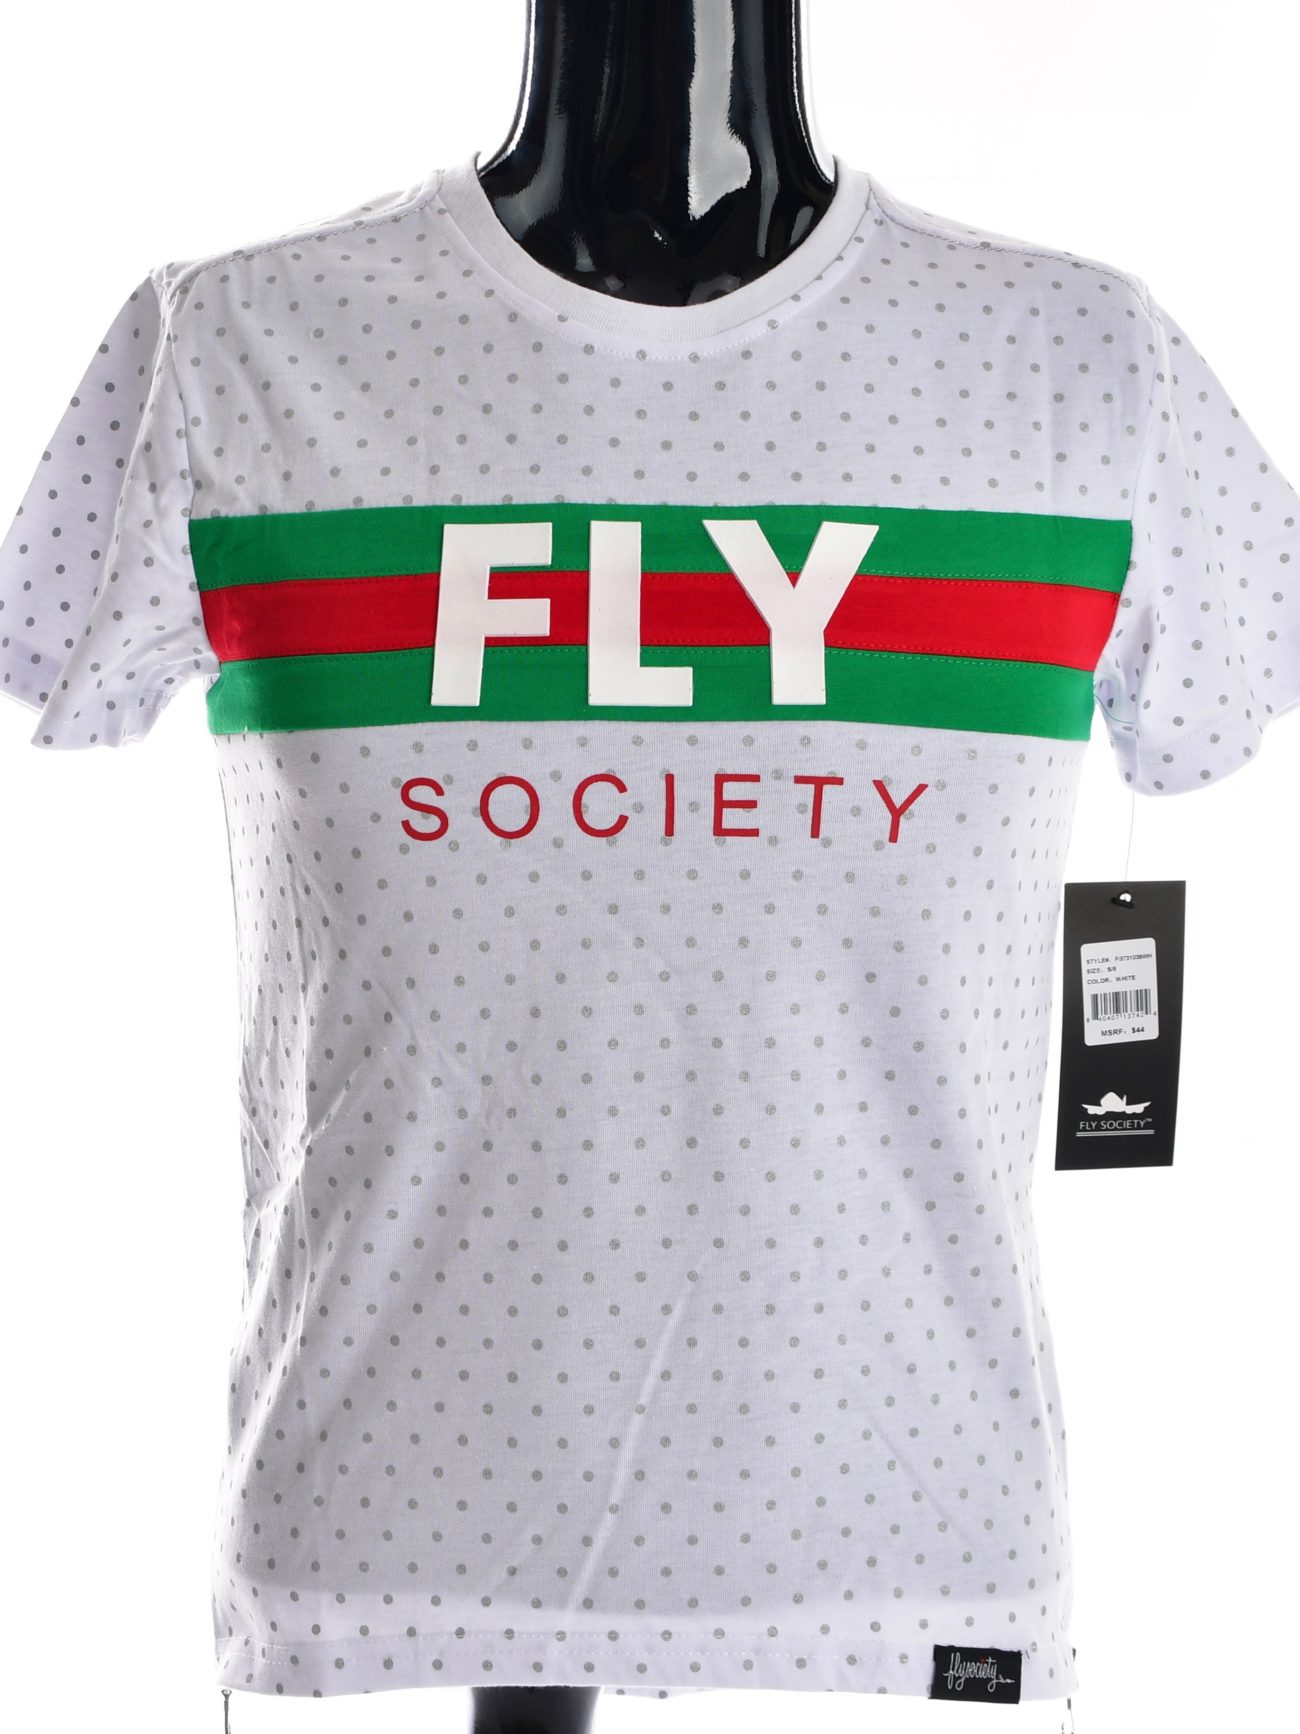 aec2c634d BOYS' FLY SOCIETY GUCCI STRIPED T-SHIRT-WHITE | EPIC VIBEZ